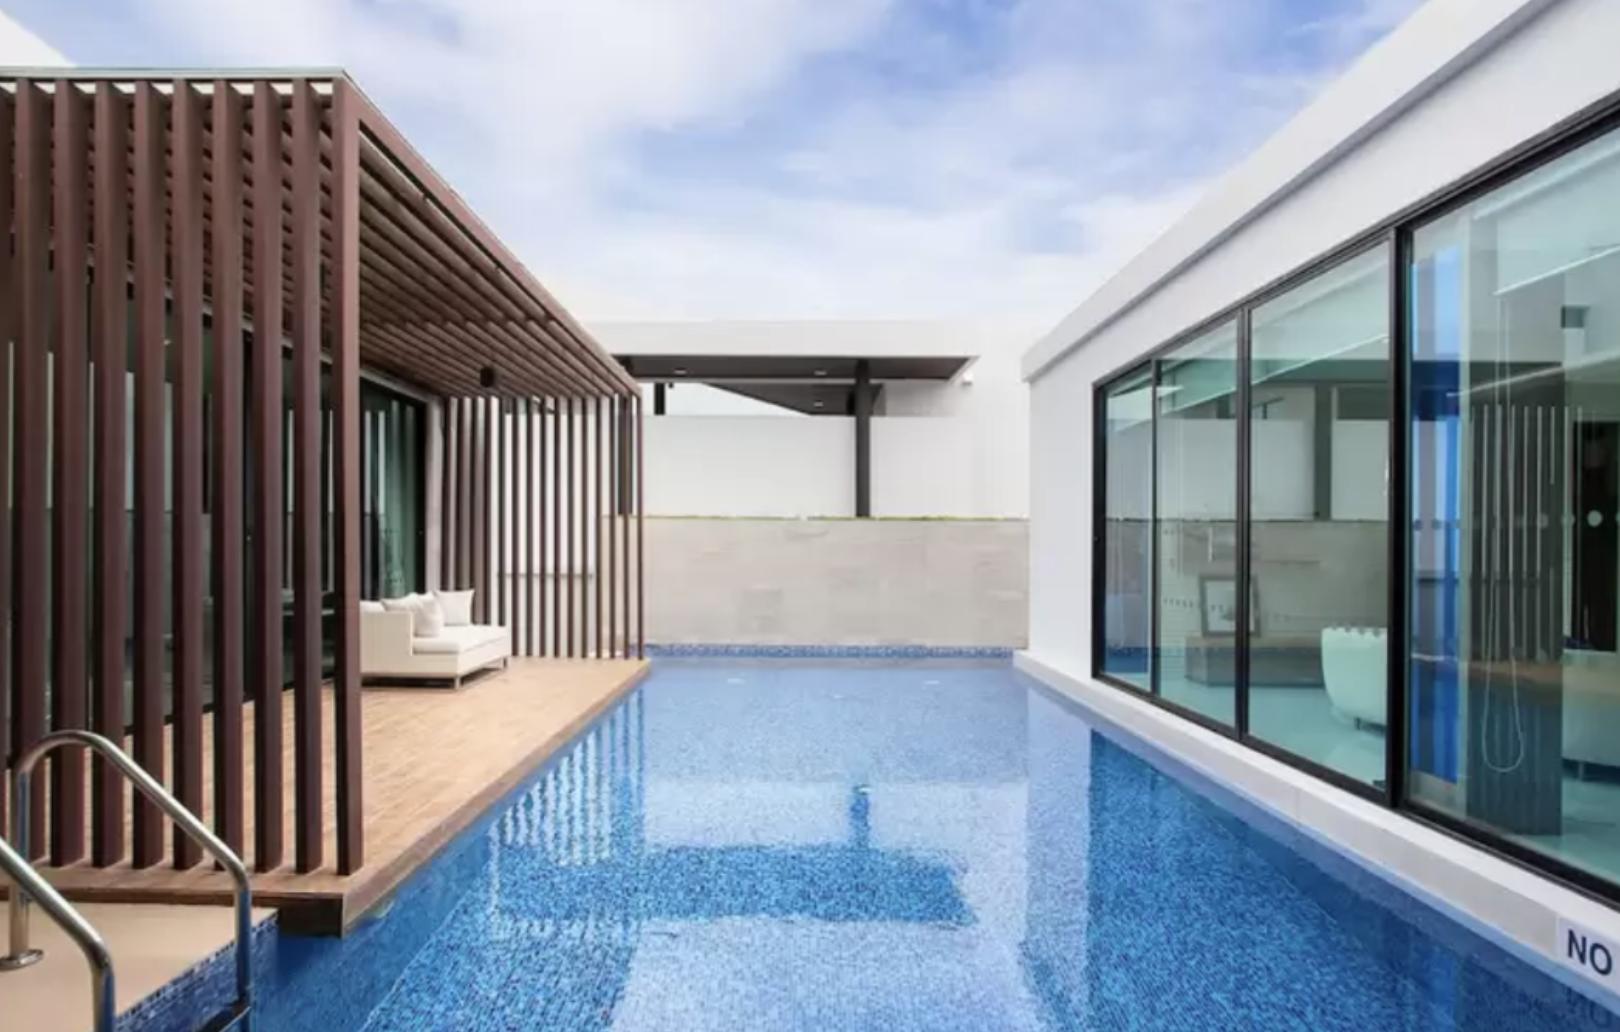 Movenpick Luxury Pool Villa In Pattaya Beach New